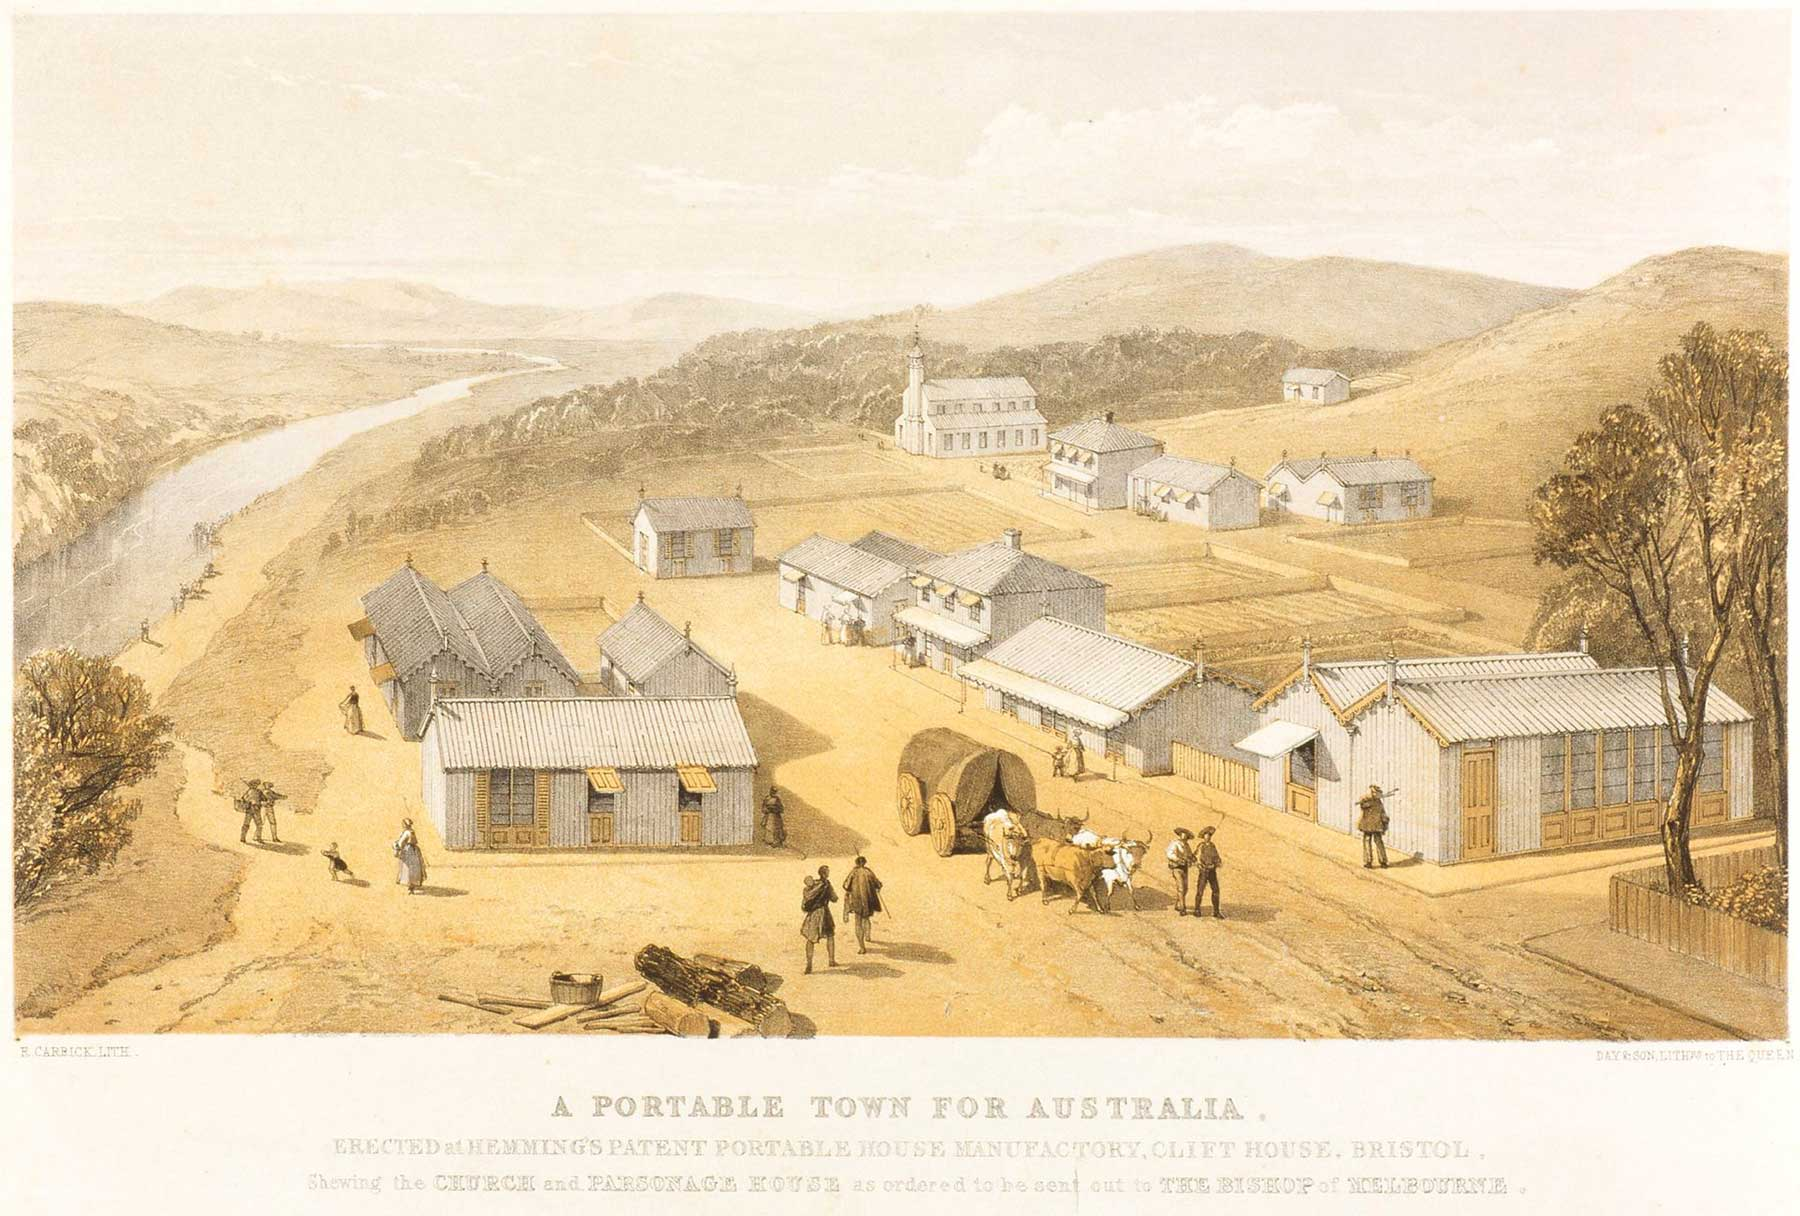 A portable Town For Australia